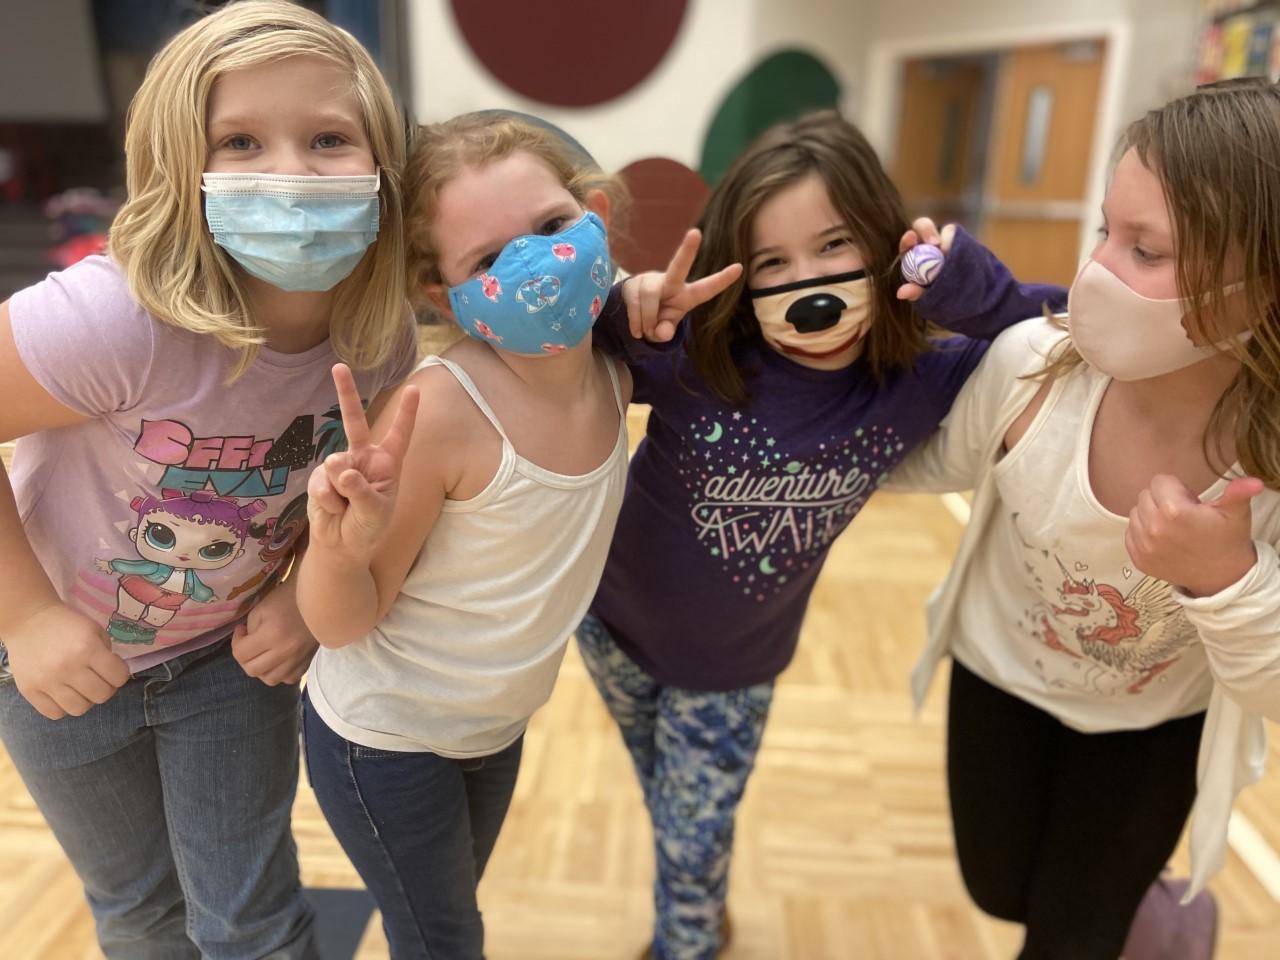 Kids at Carmel Elementary ESE